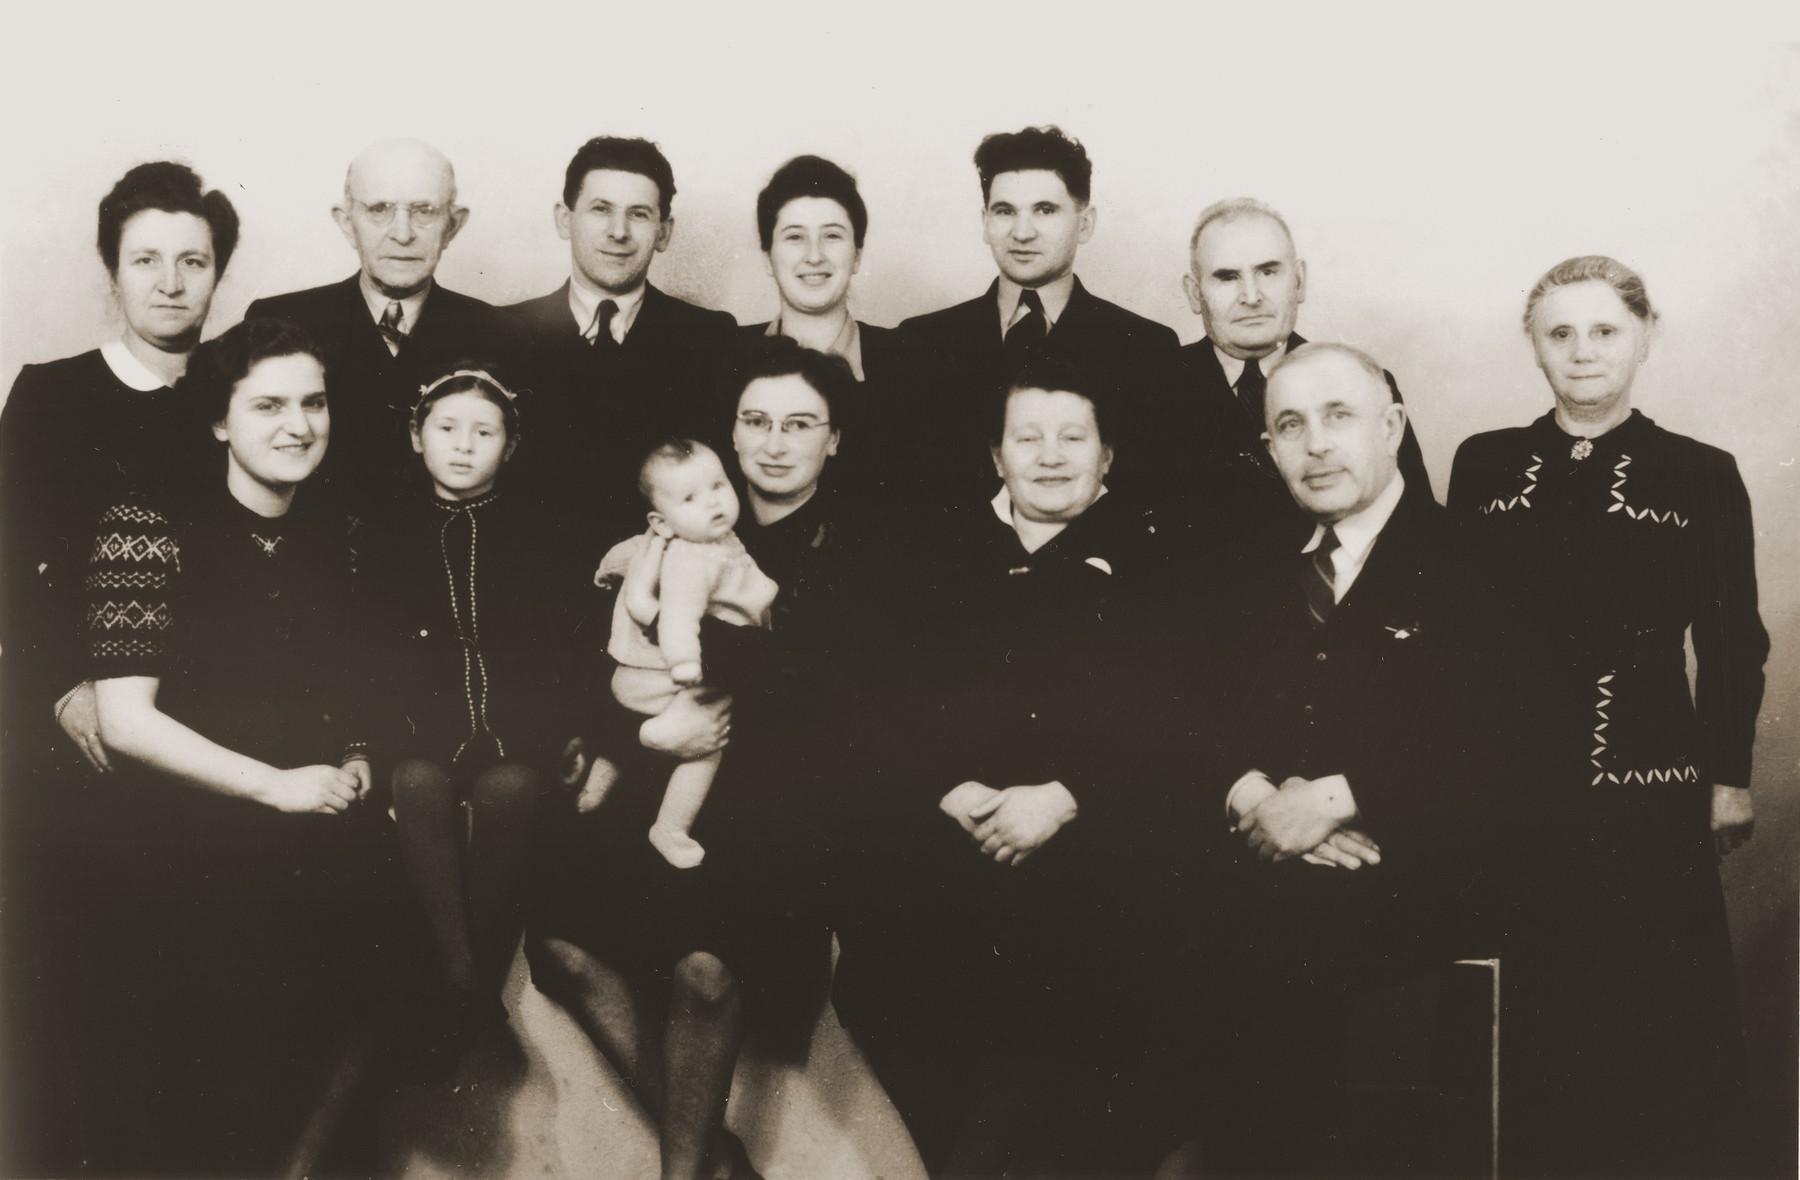 Group portrait of members of the Jewish community of Eibergen in 1947.  Pictured in the front row from left to right are: Bep Menco; Betty Rosenbaum; Nora de Jong Zion holding her daughter, Sera Elizabeth; Jenny Frank Silberberg; Jenny's husband.  In the back row from left to right are: Fie van Gelder Menco; Jenny's brother-in-law; Julius Zion; Bep Meijer; Sallie Zion; Lehman van Gelder; Anna van Gelder.